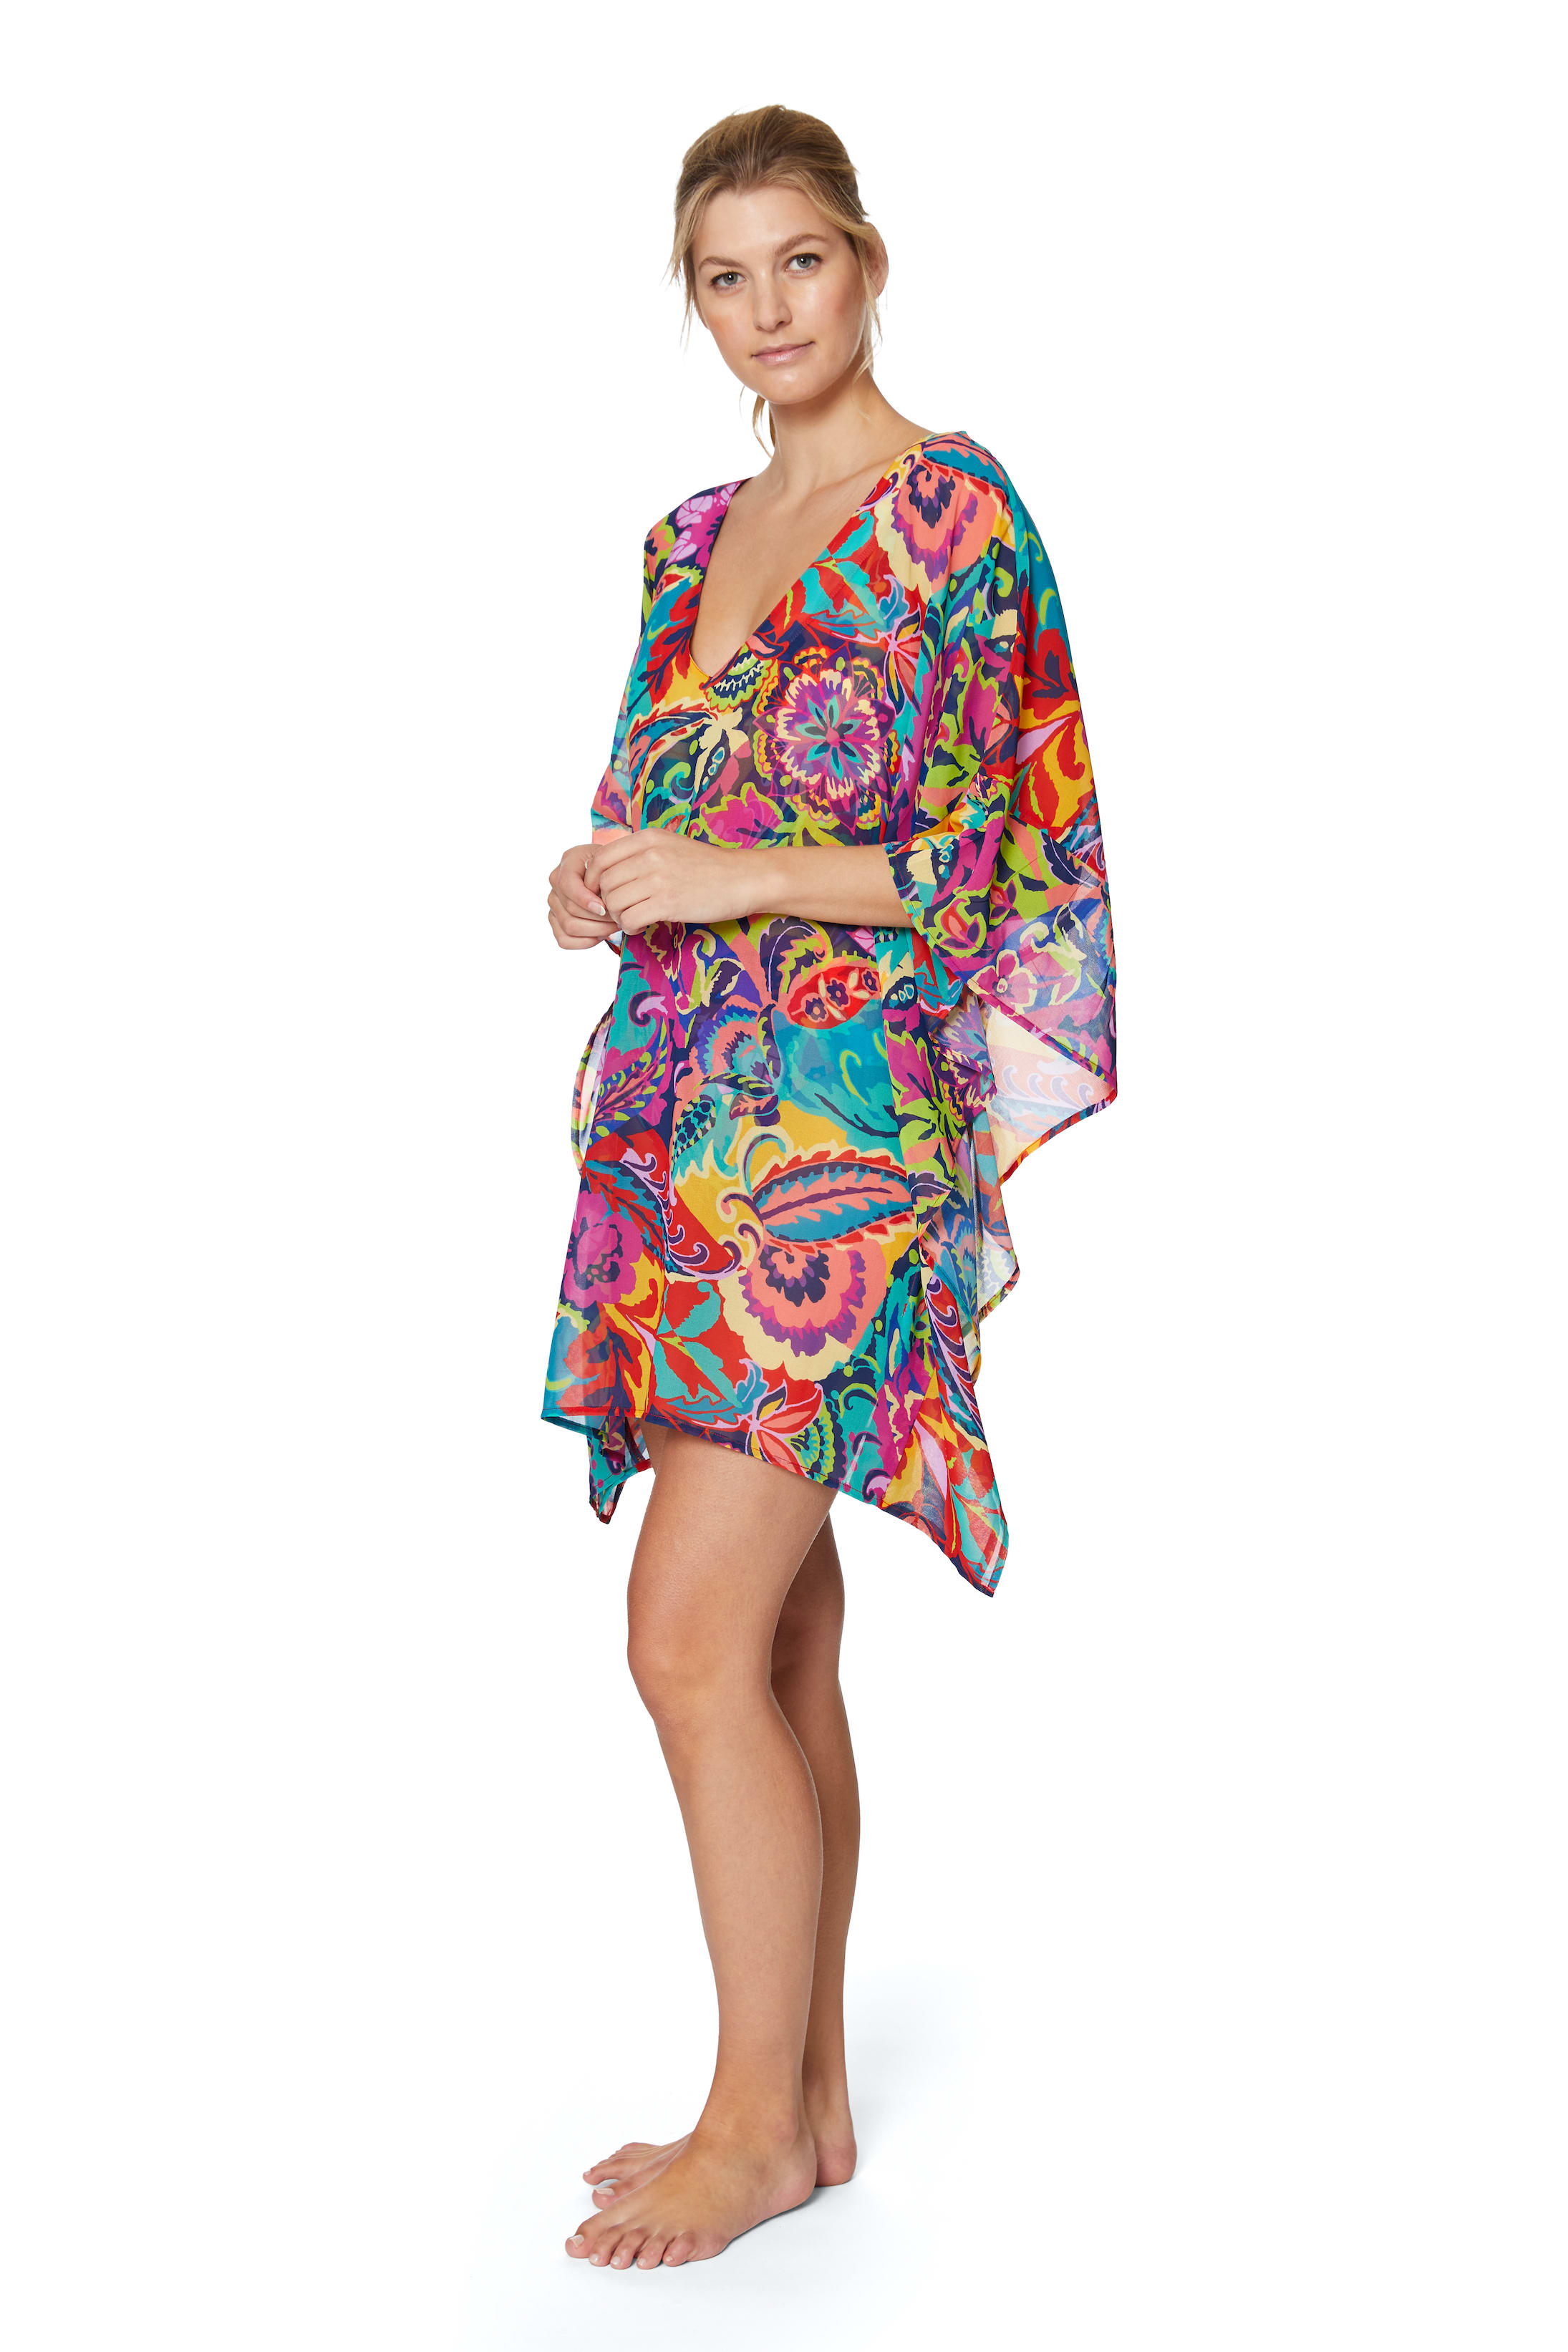 Tahari® Paris Floral Tunic Swimsuit Cover-Up - Multi - Front